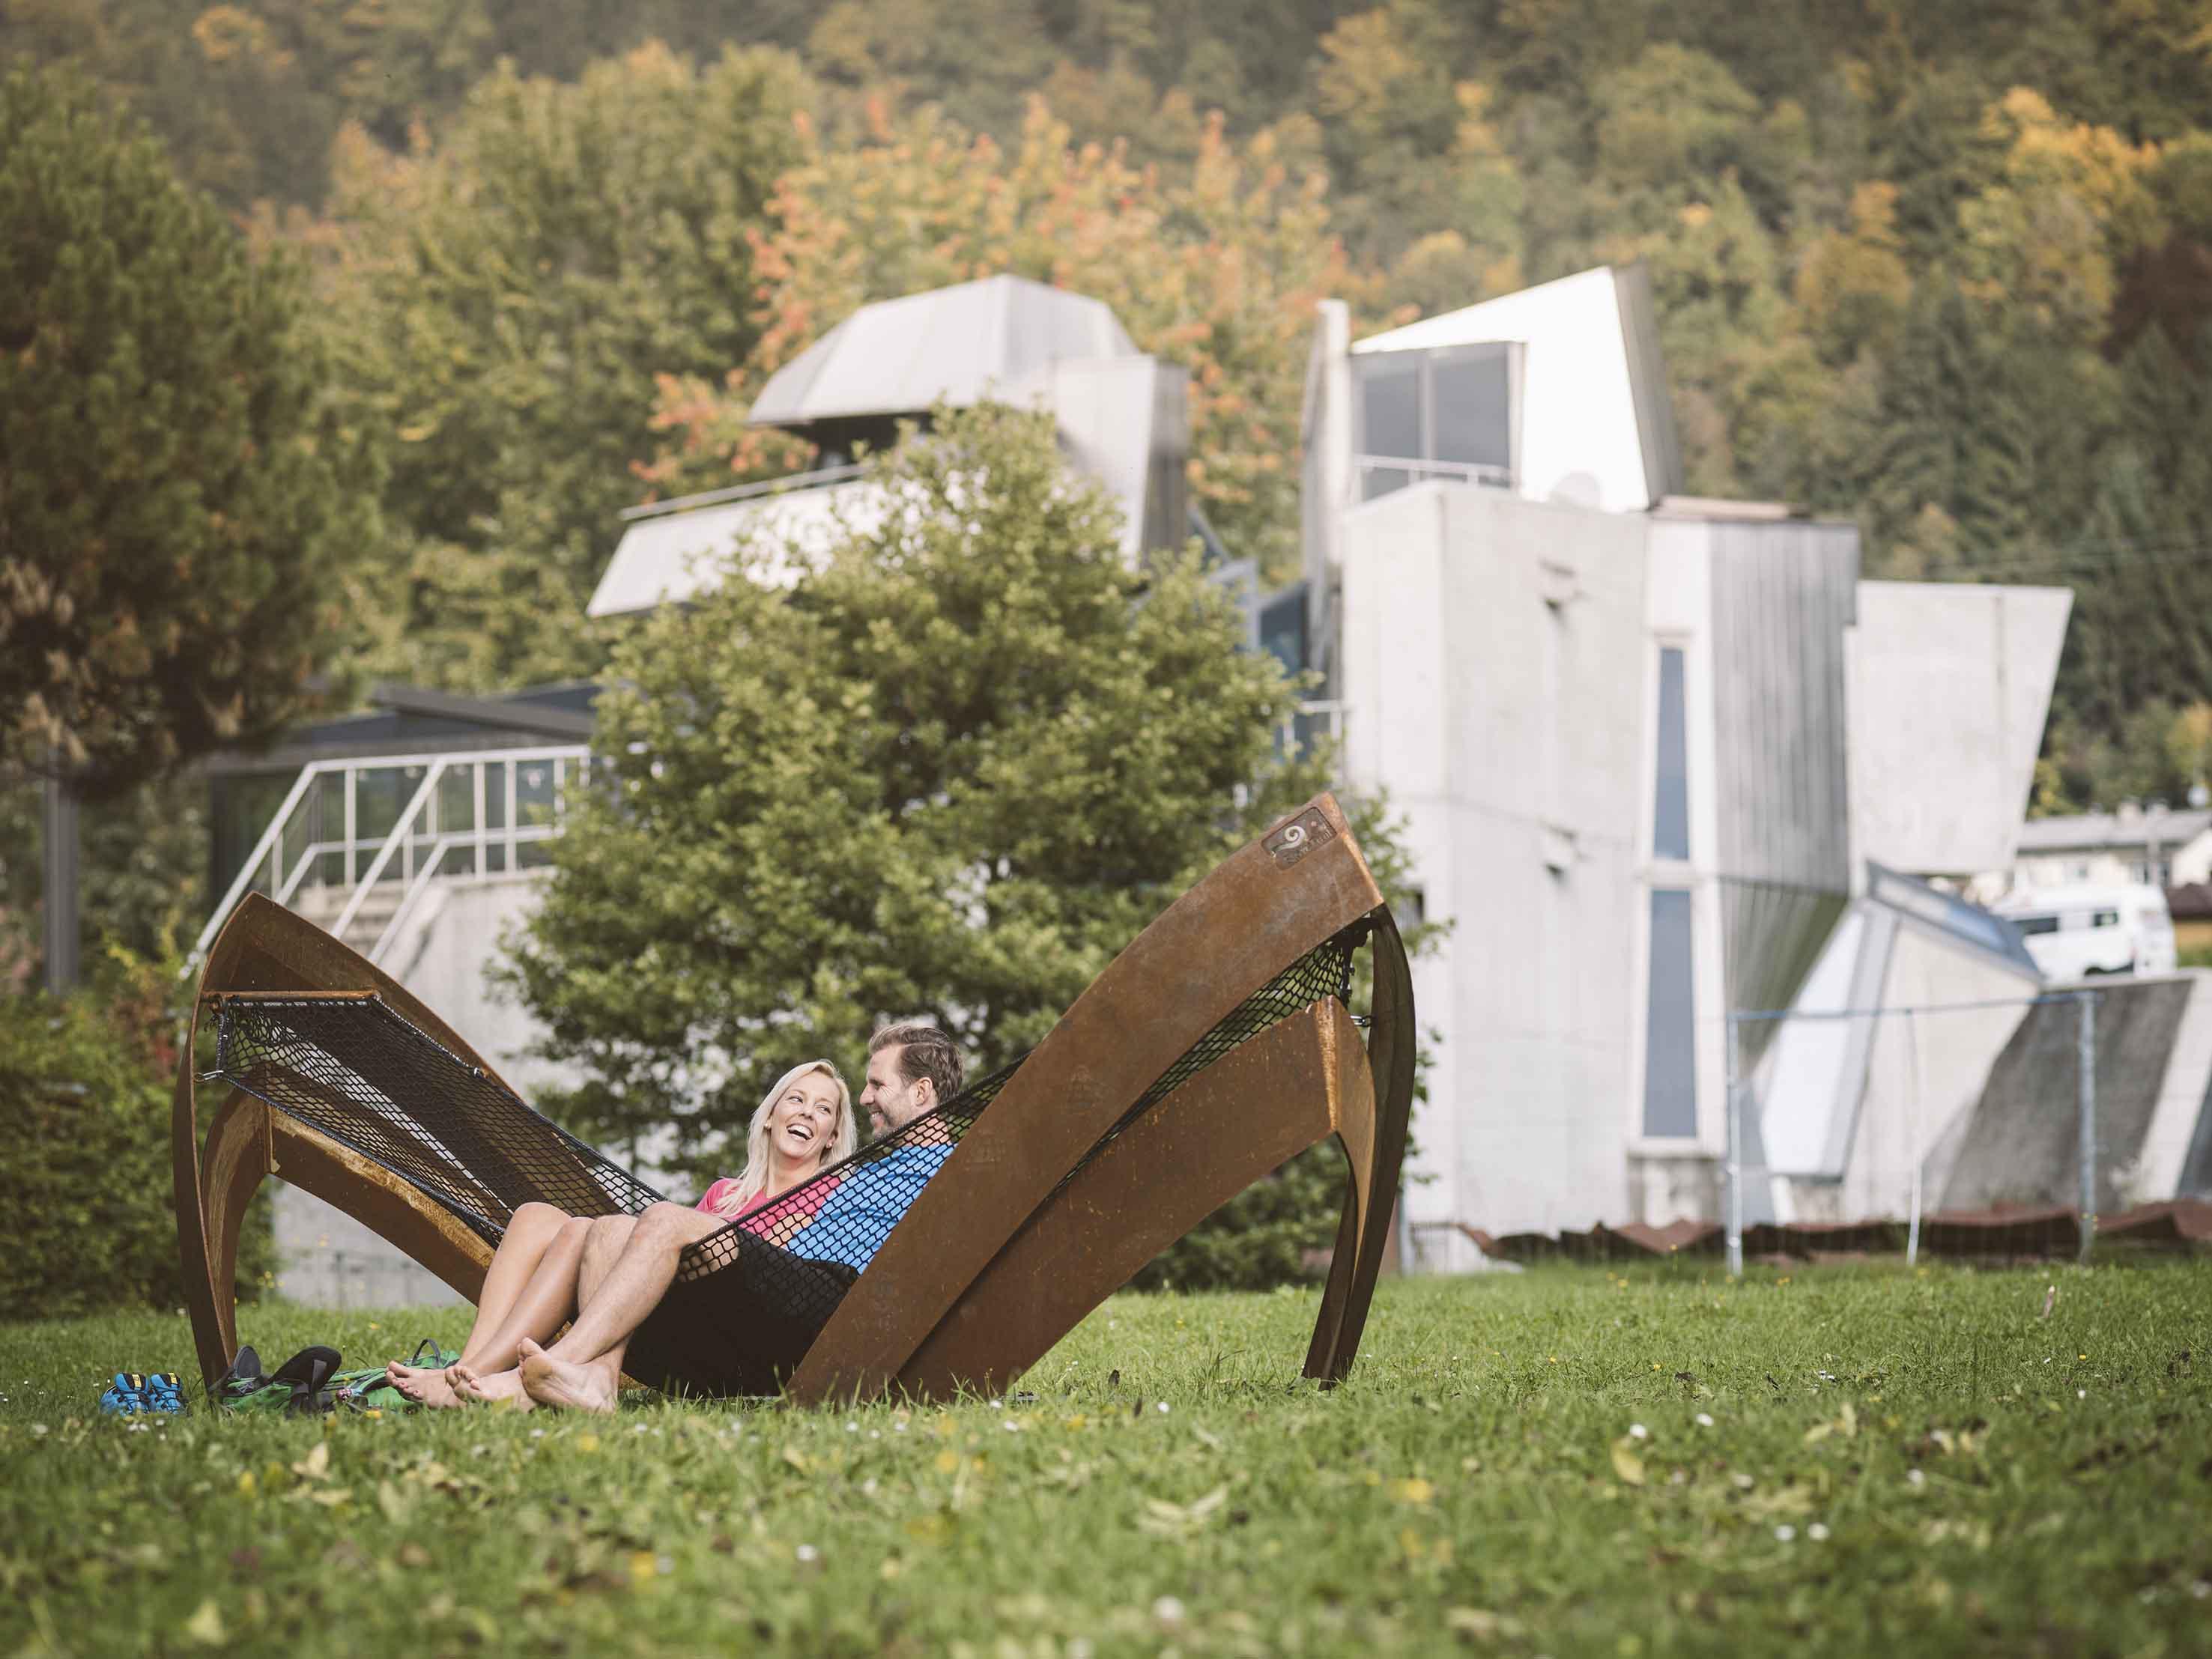 Copyright_Region-Villach-Tourismus_Stefan-Leitner_Slow-Trail-Bleistätter-Moor-4